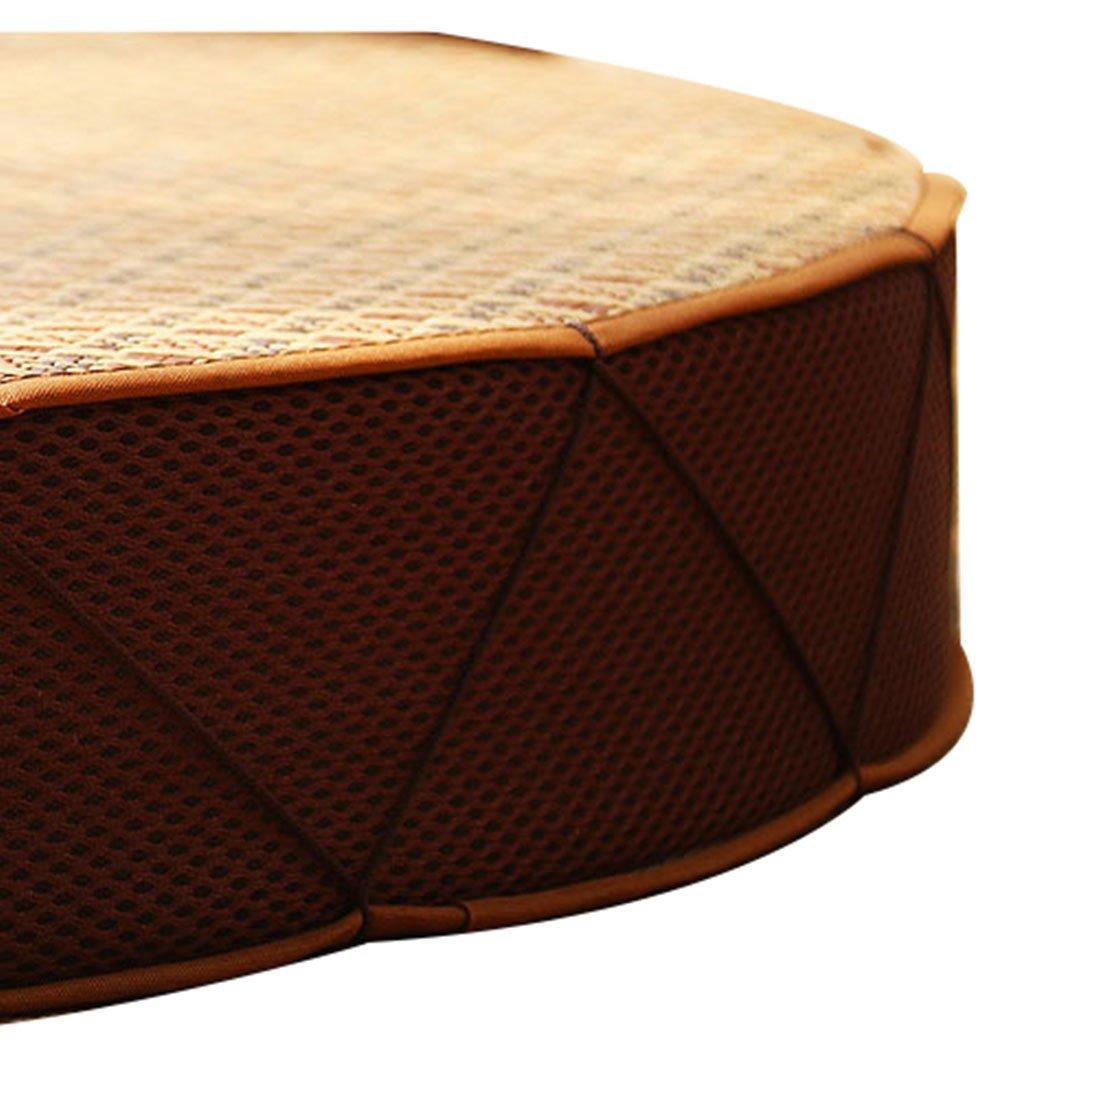 Round Wood Tree Soft Plush Chair Seat Cushion Stump Shaped Pillow 11.8x1.6inch by Fandim Fly (Image #5)